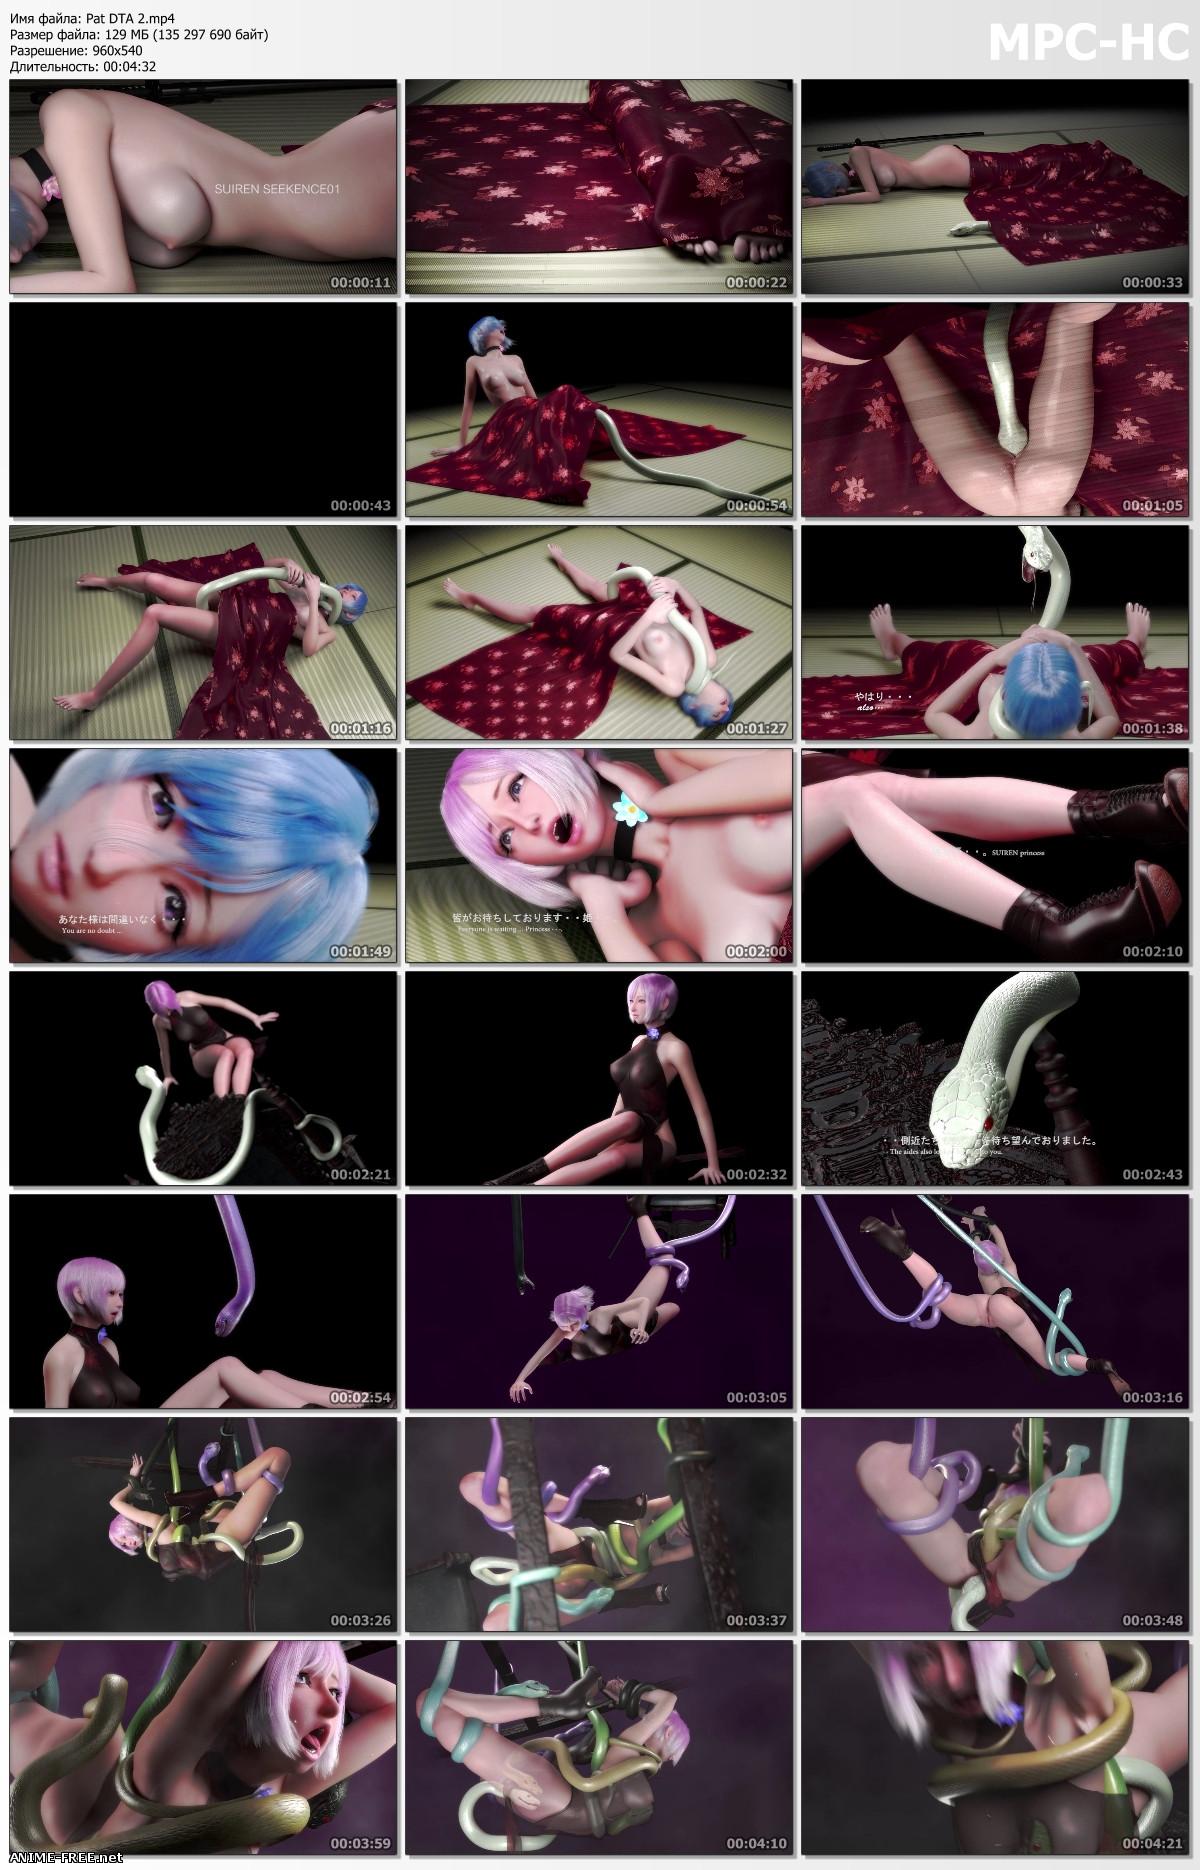 SUIRENseekence02 [2019] [Uncen] [JAP] 3D-Hentai